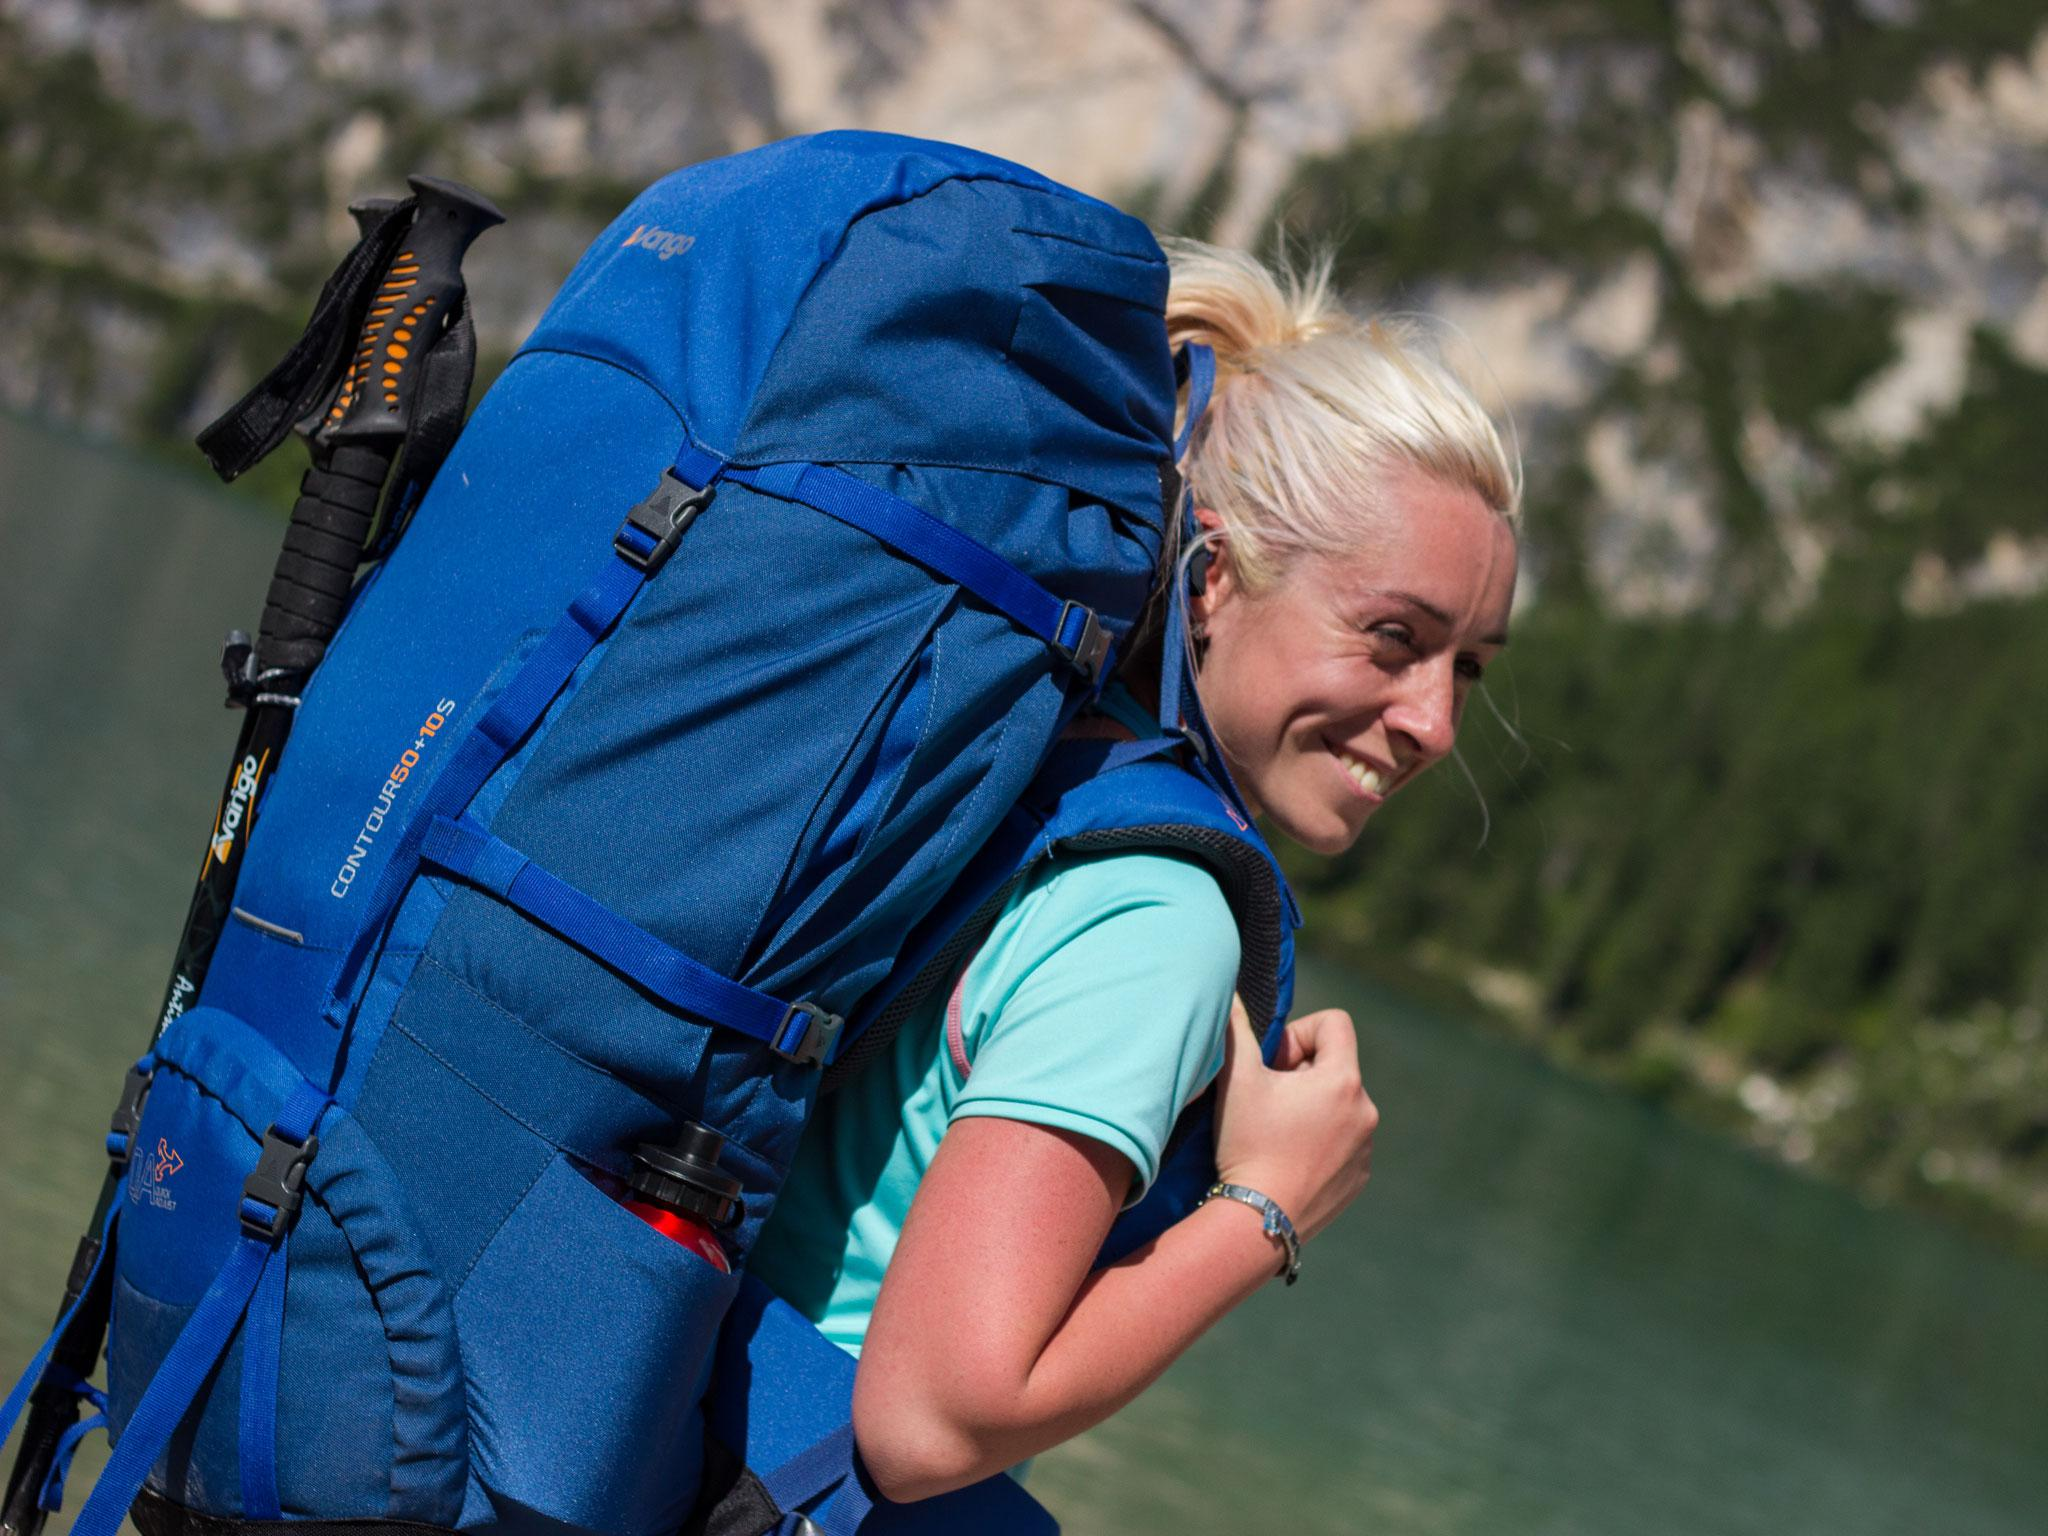 de2db9fba2 8 best rucksacks for backpackers